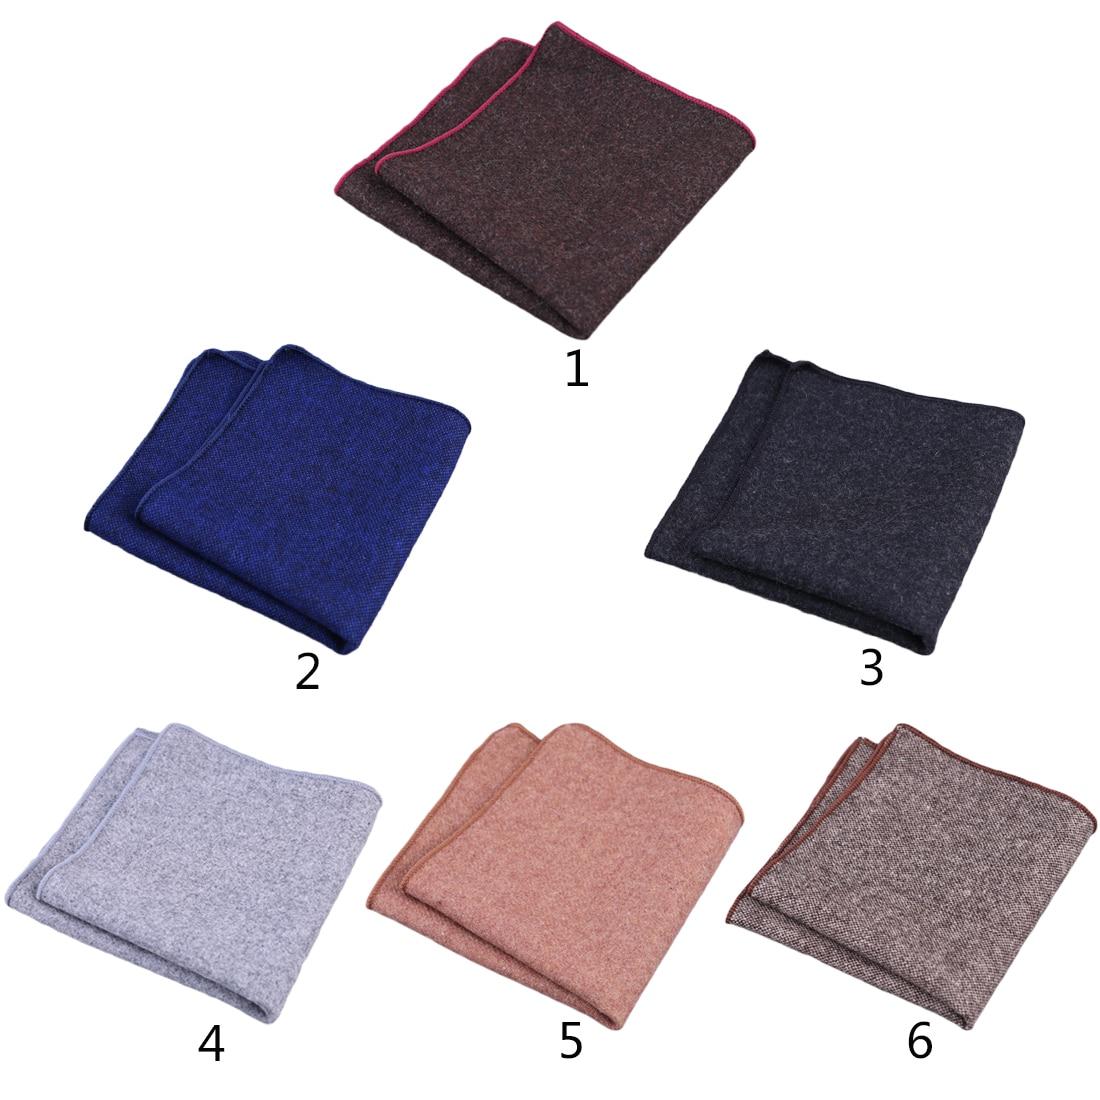 Hot Hankerchief Scarves Vintage Wool Hankies Men's Pocket Square Handkerchiefs Striped Solid Cotton 23*23cm